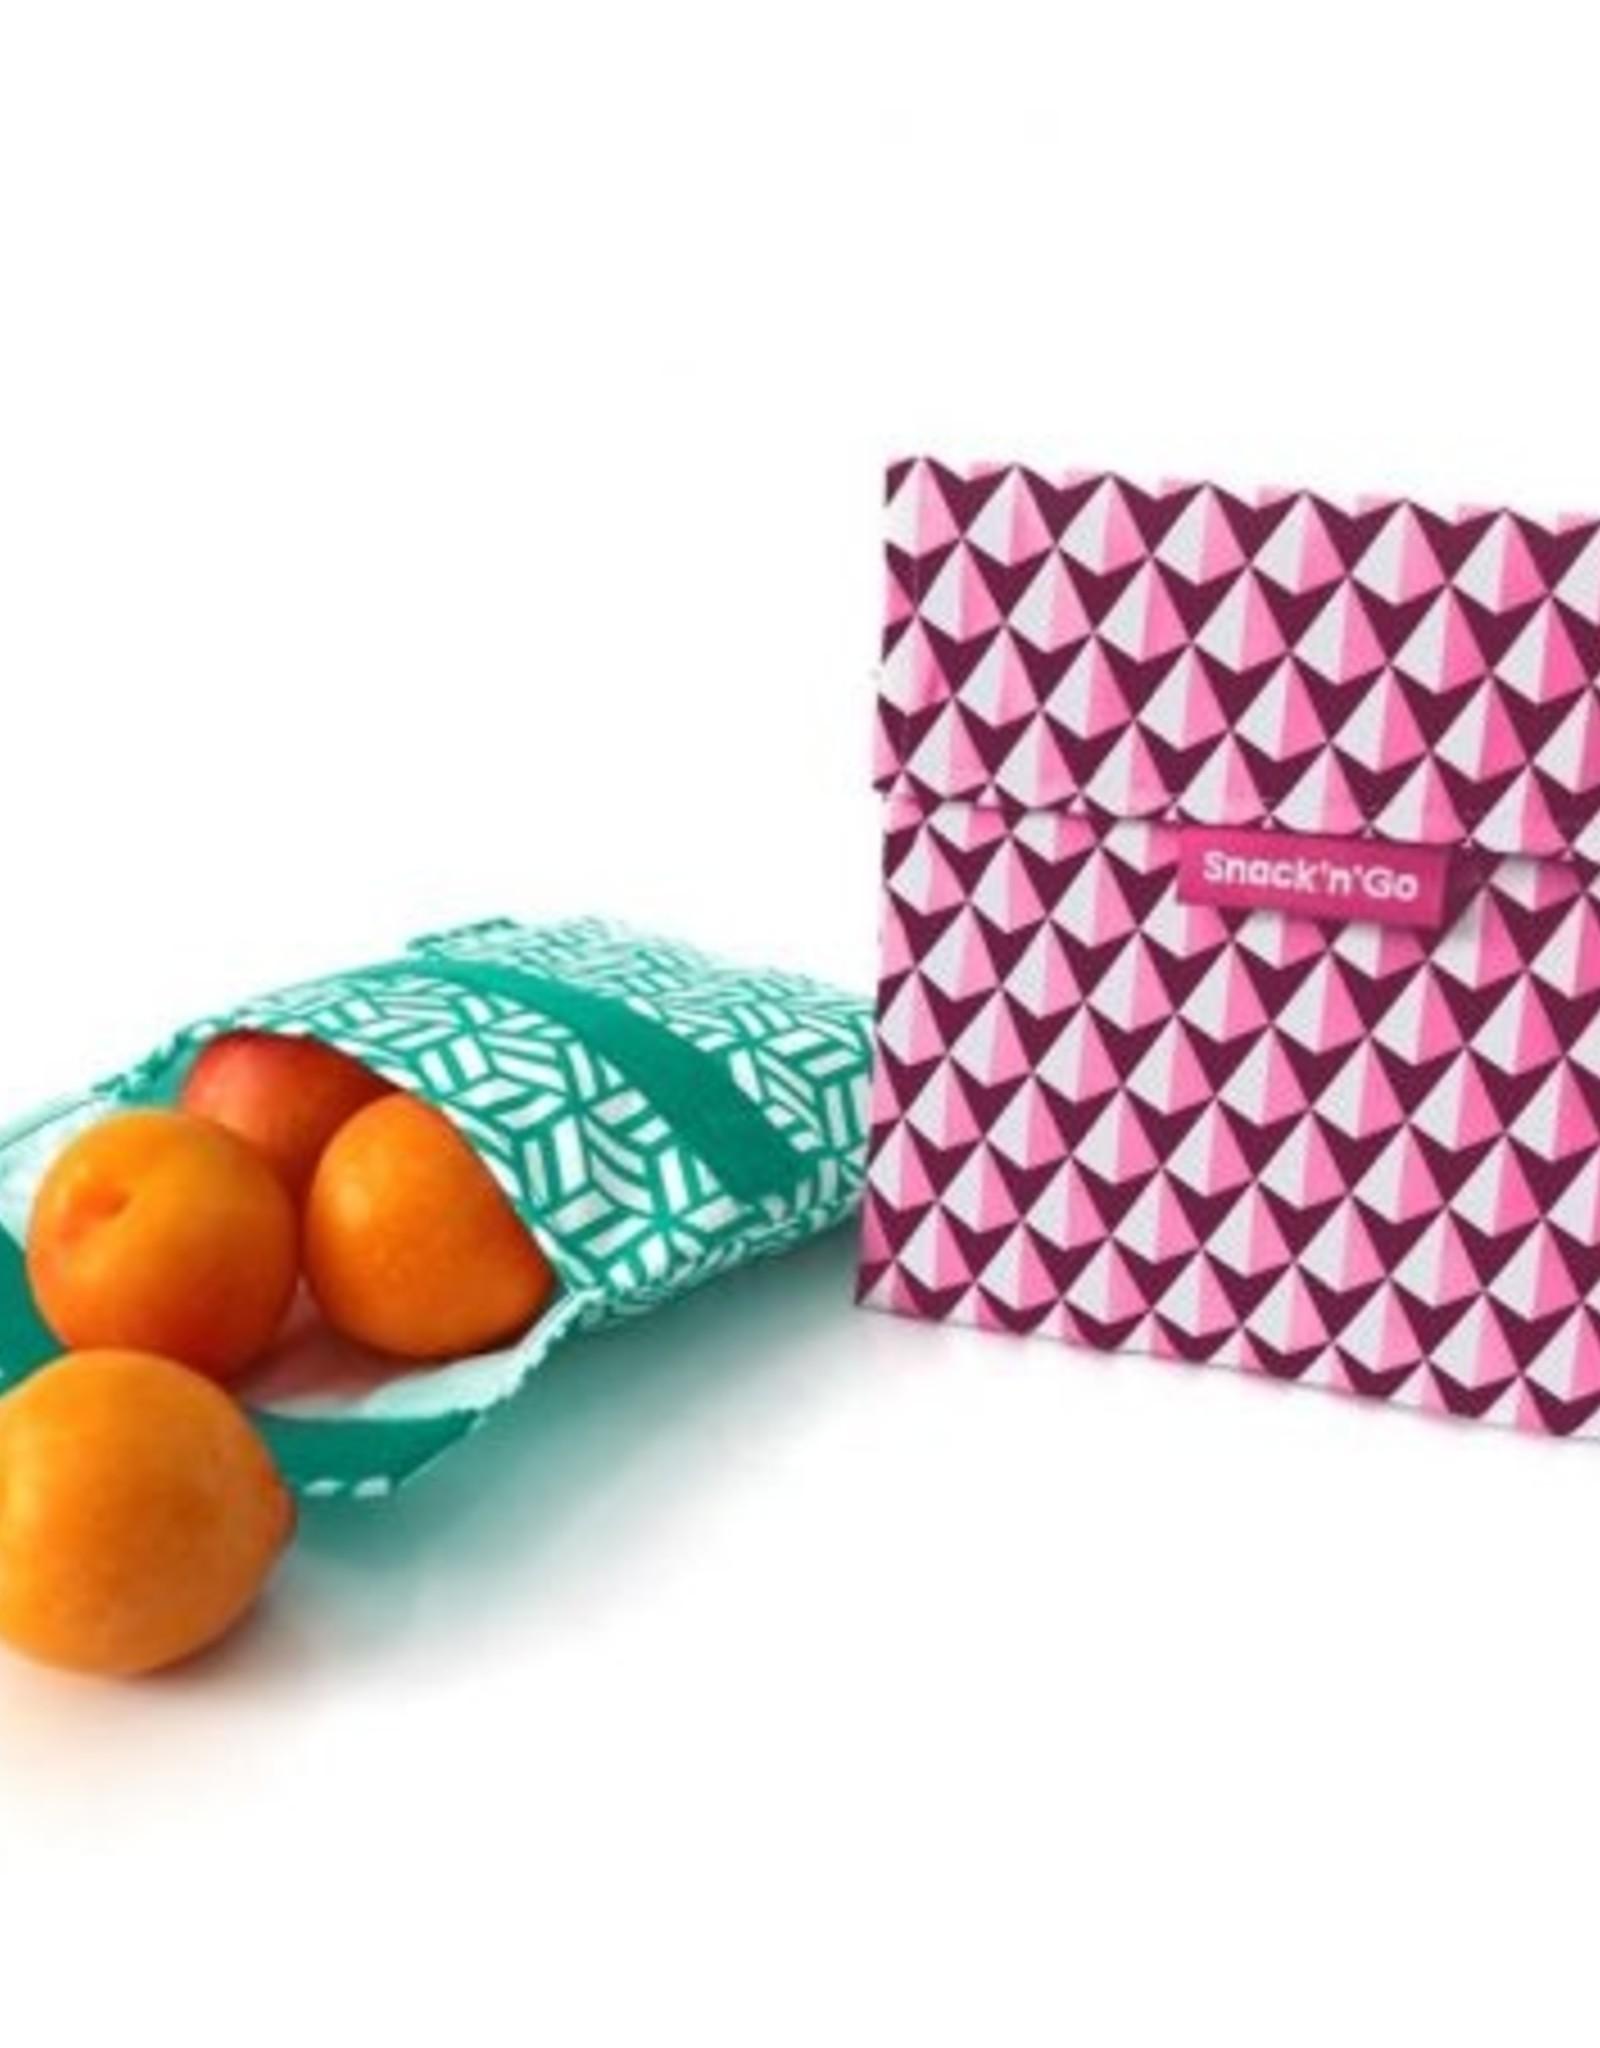 Roll'Eat Snack'n'Go - Tiles pink